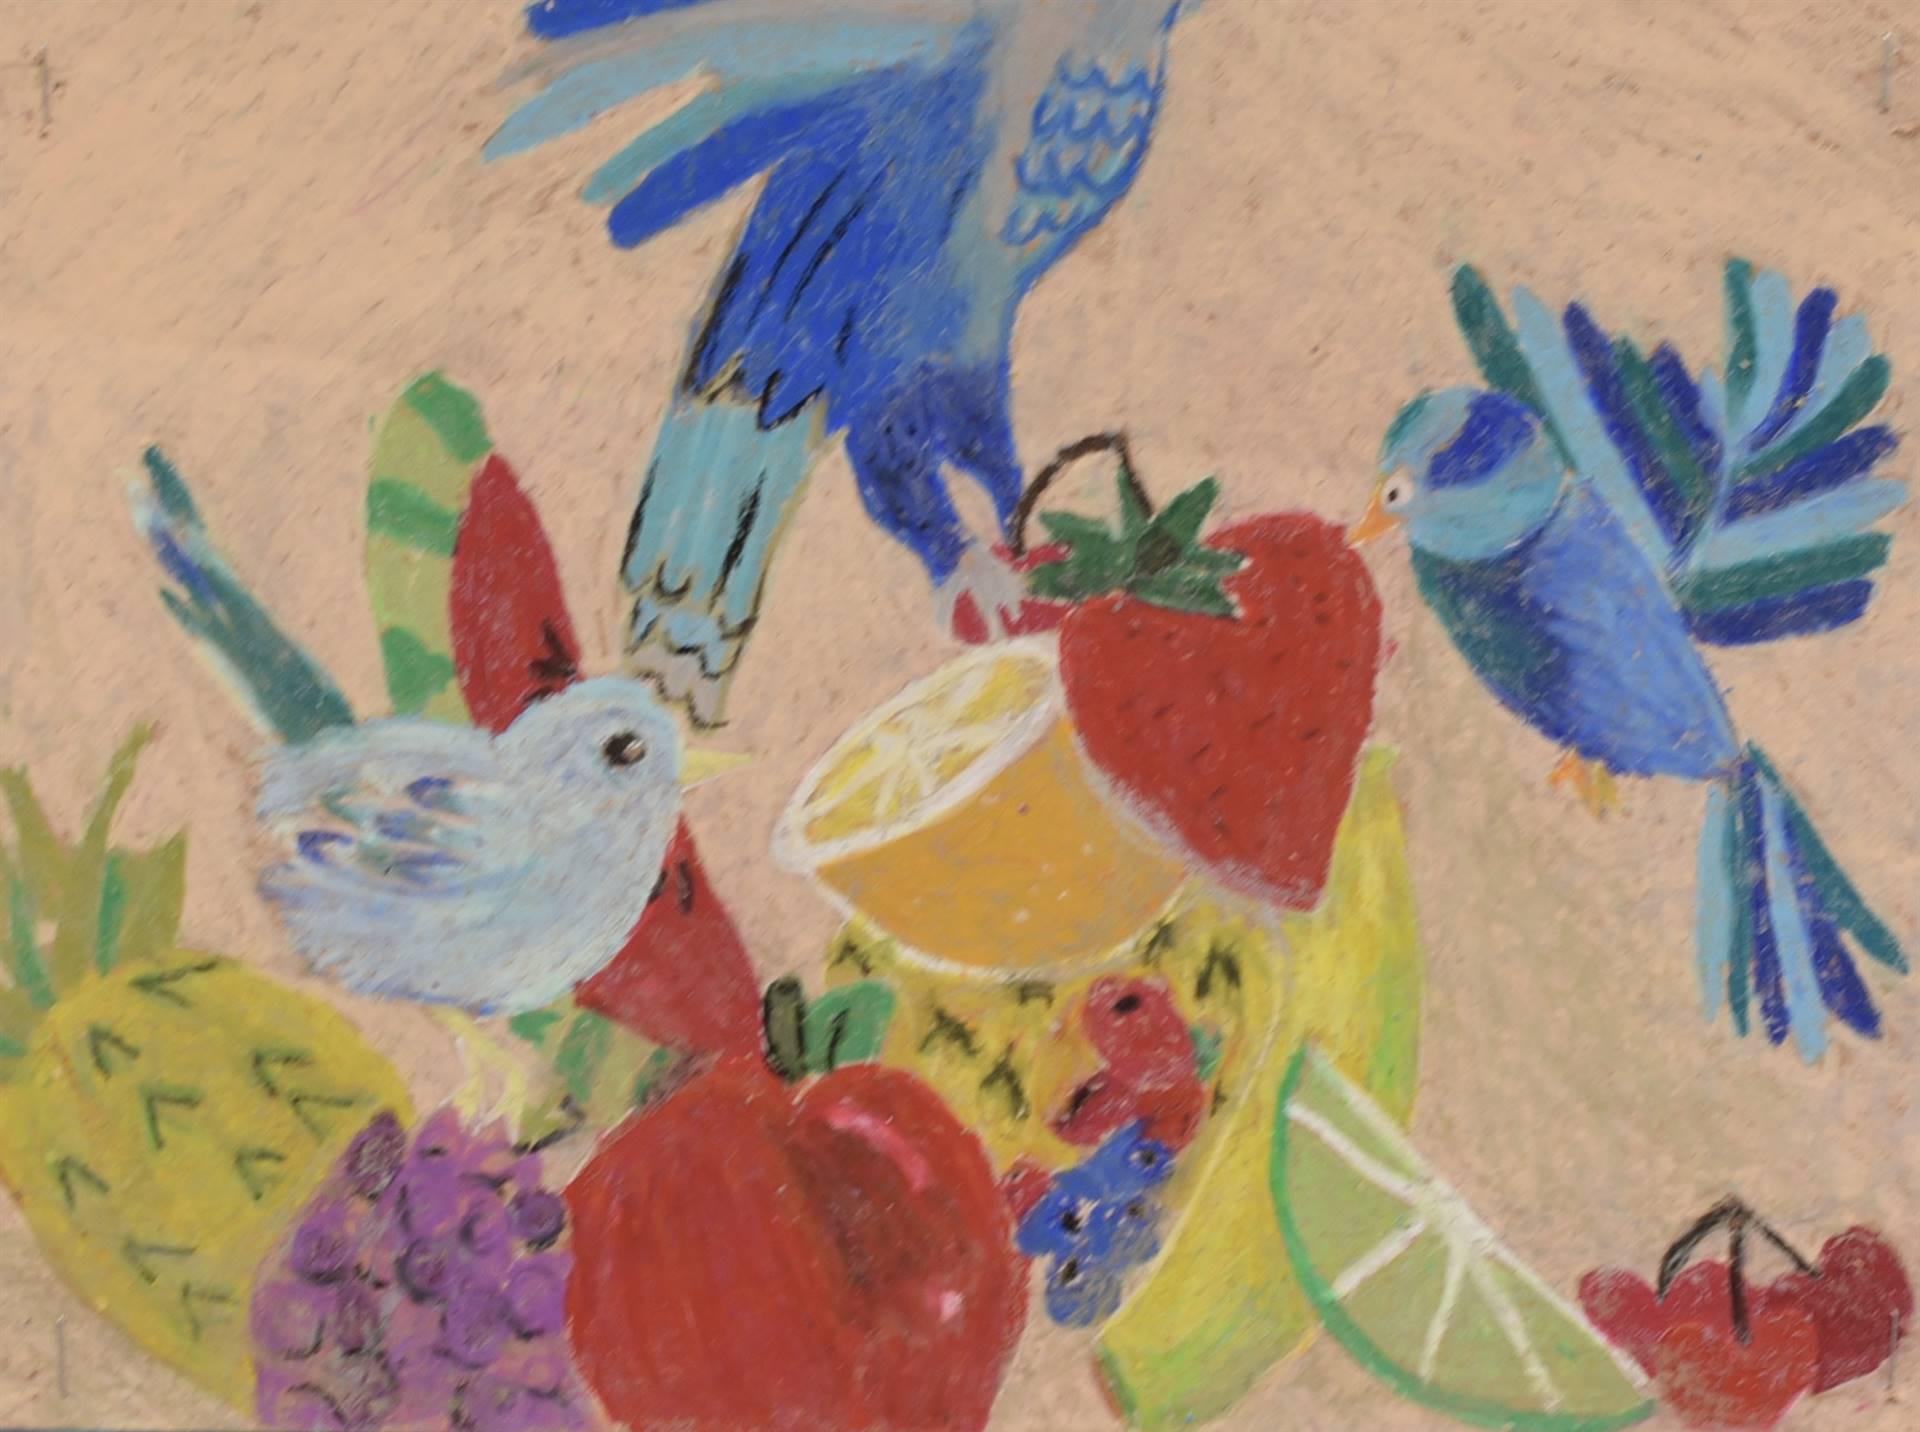 Brecksville-Broadview Hts. Middle School Art Projects 110